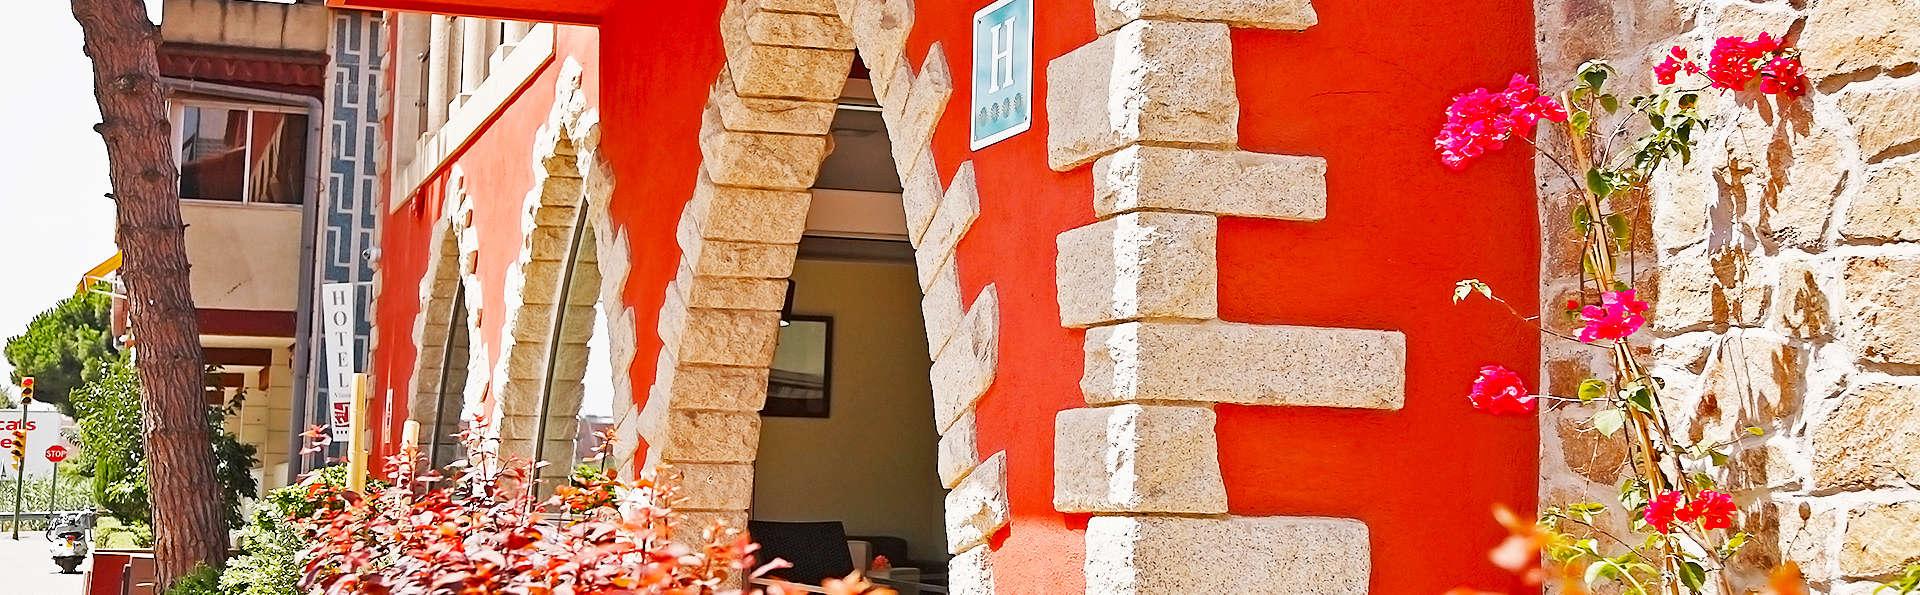 Hotel Vilassar - EDIT_2_FACHADA.jpg